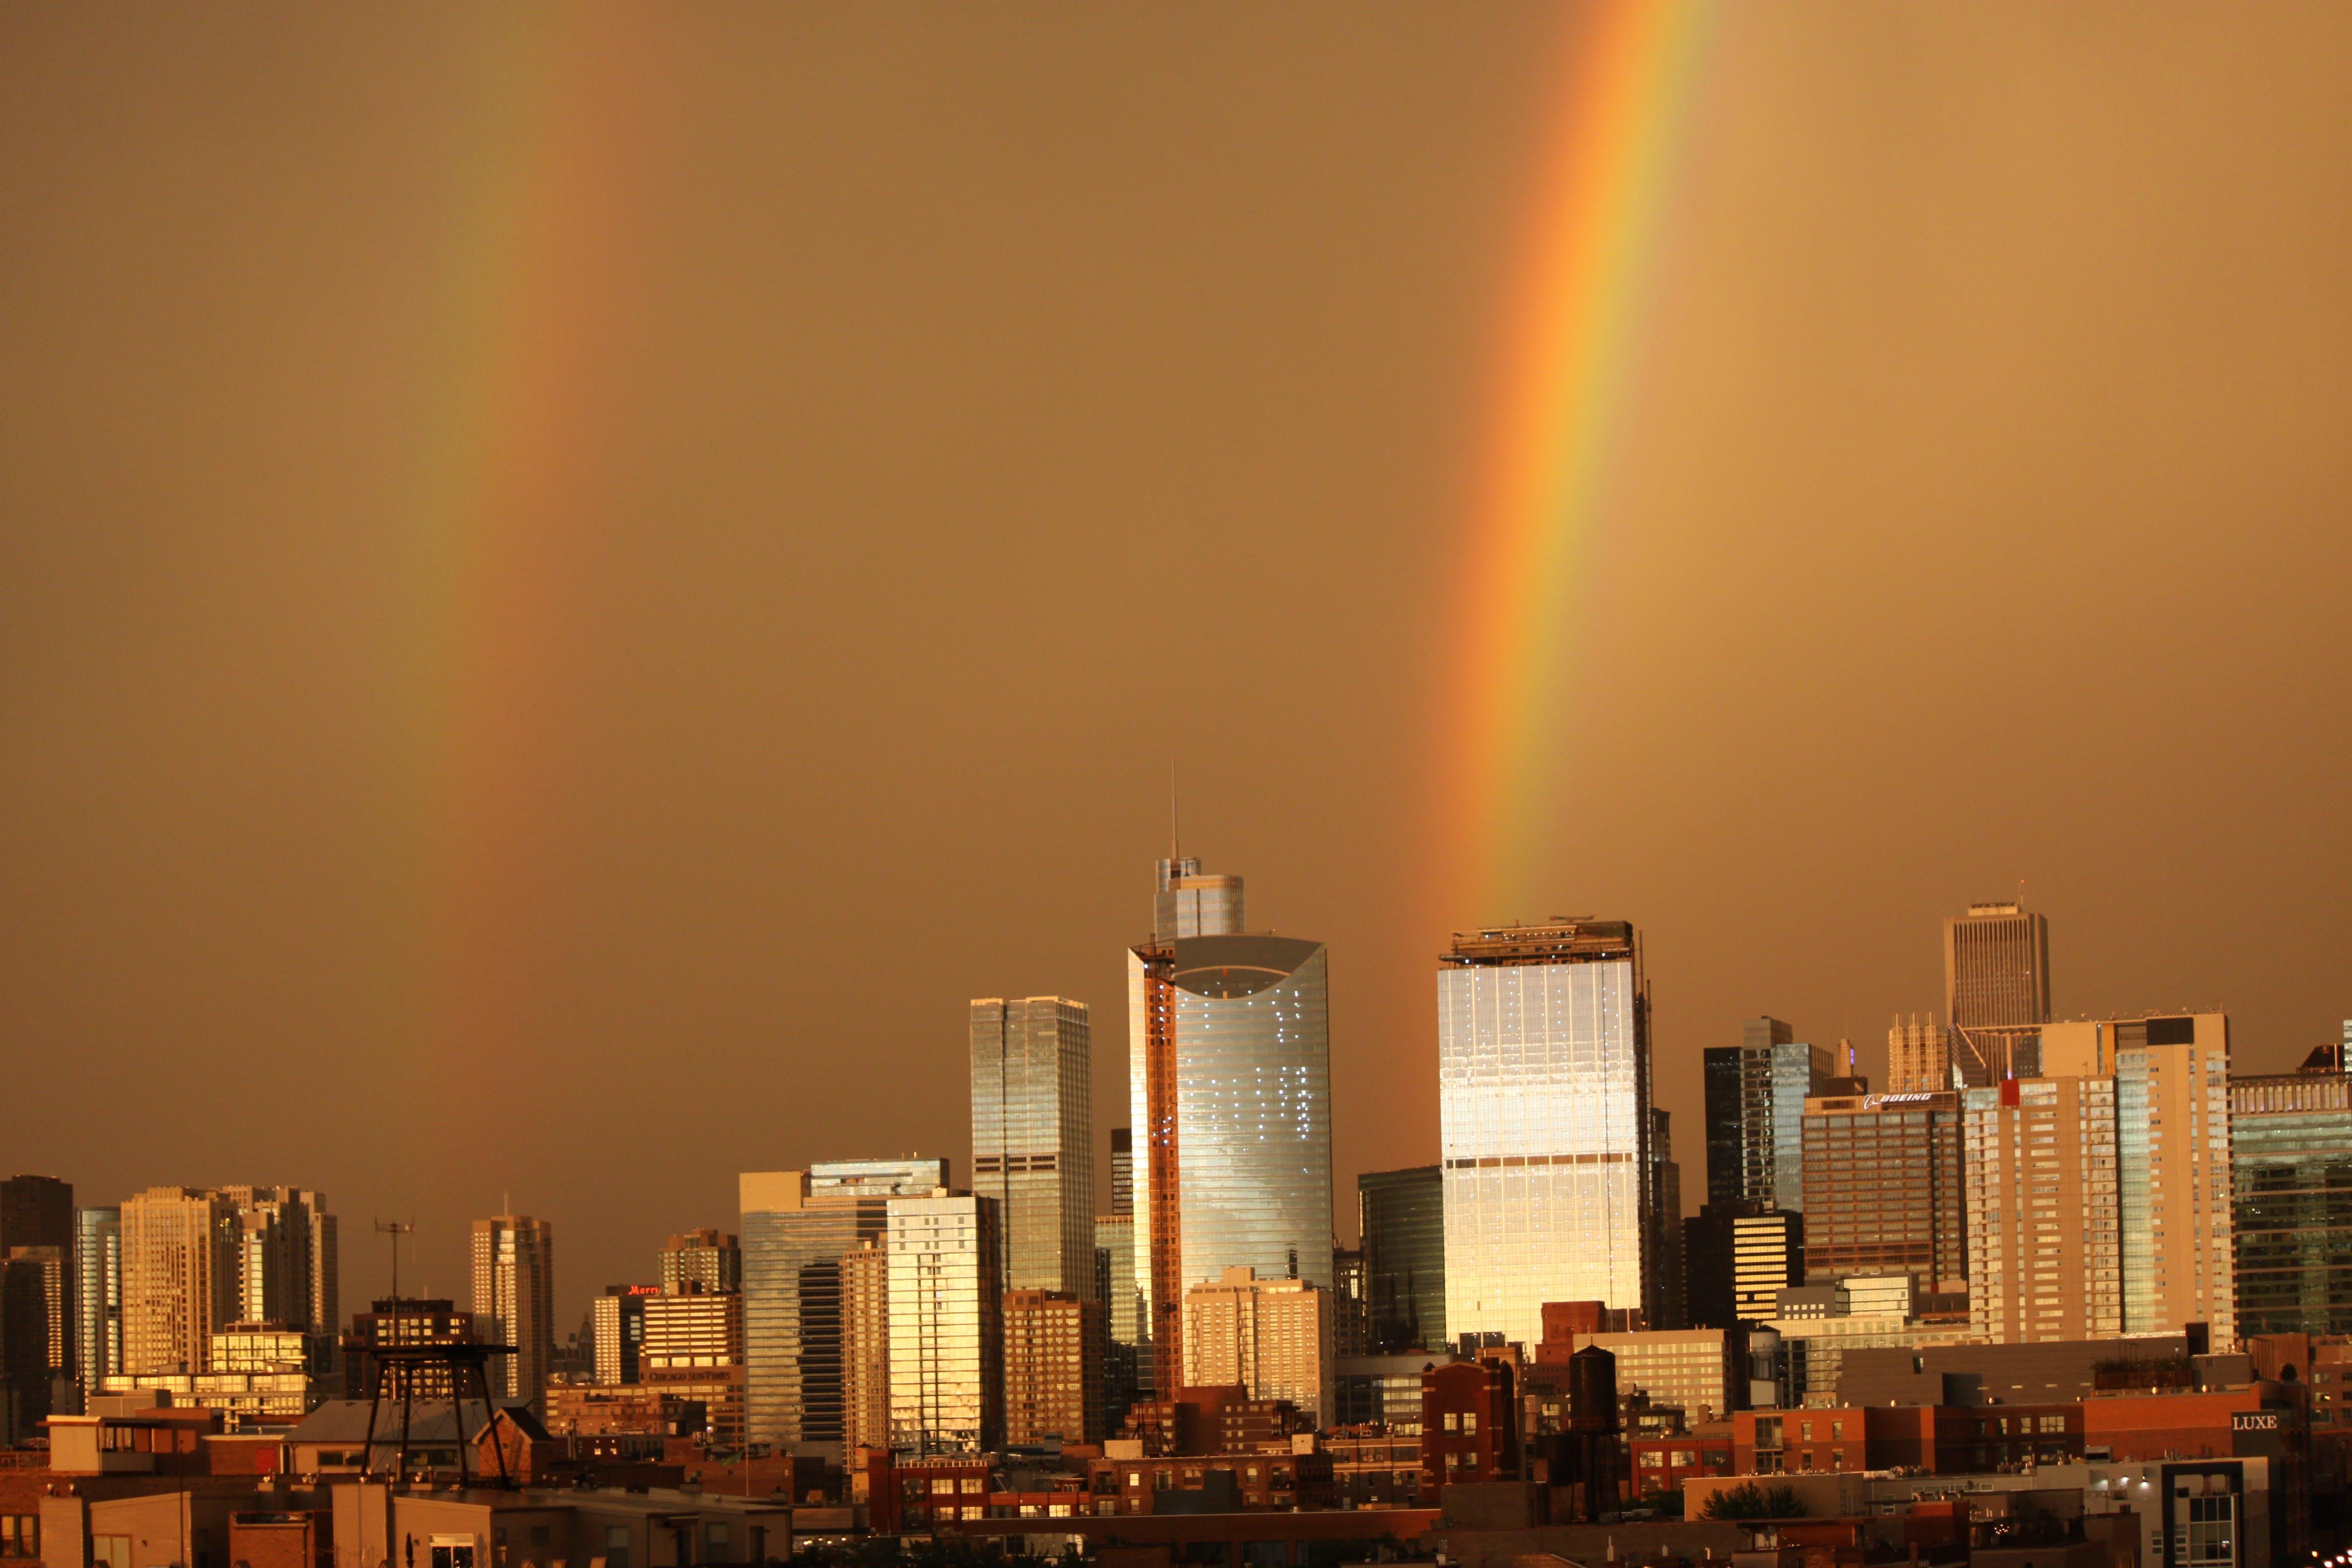 Free stock photo of Chicago Double Rainbow